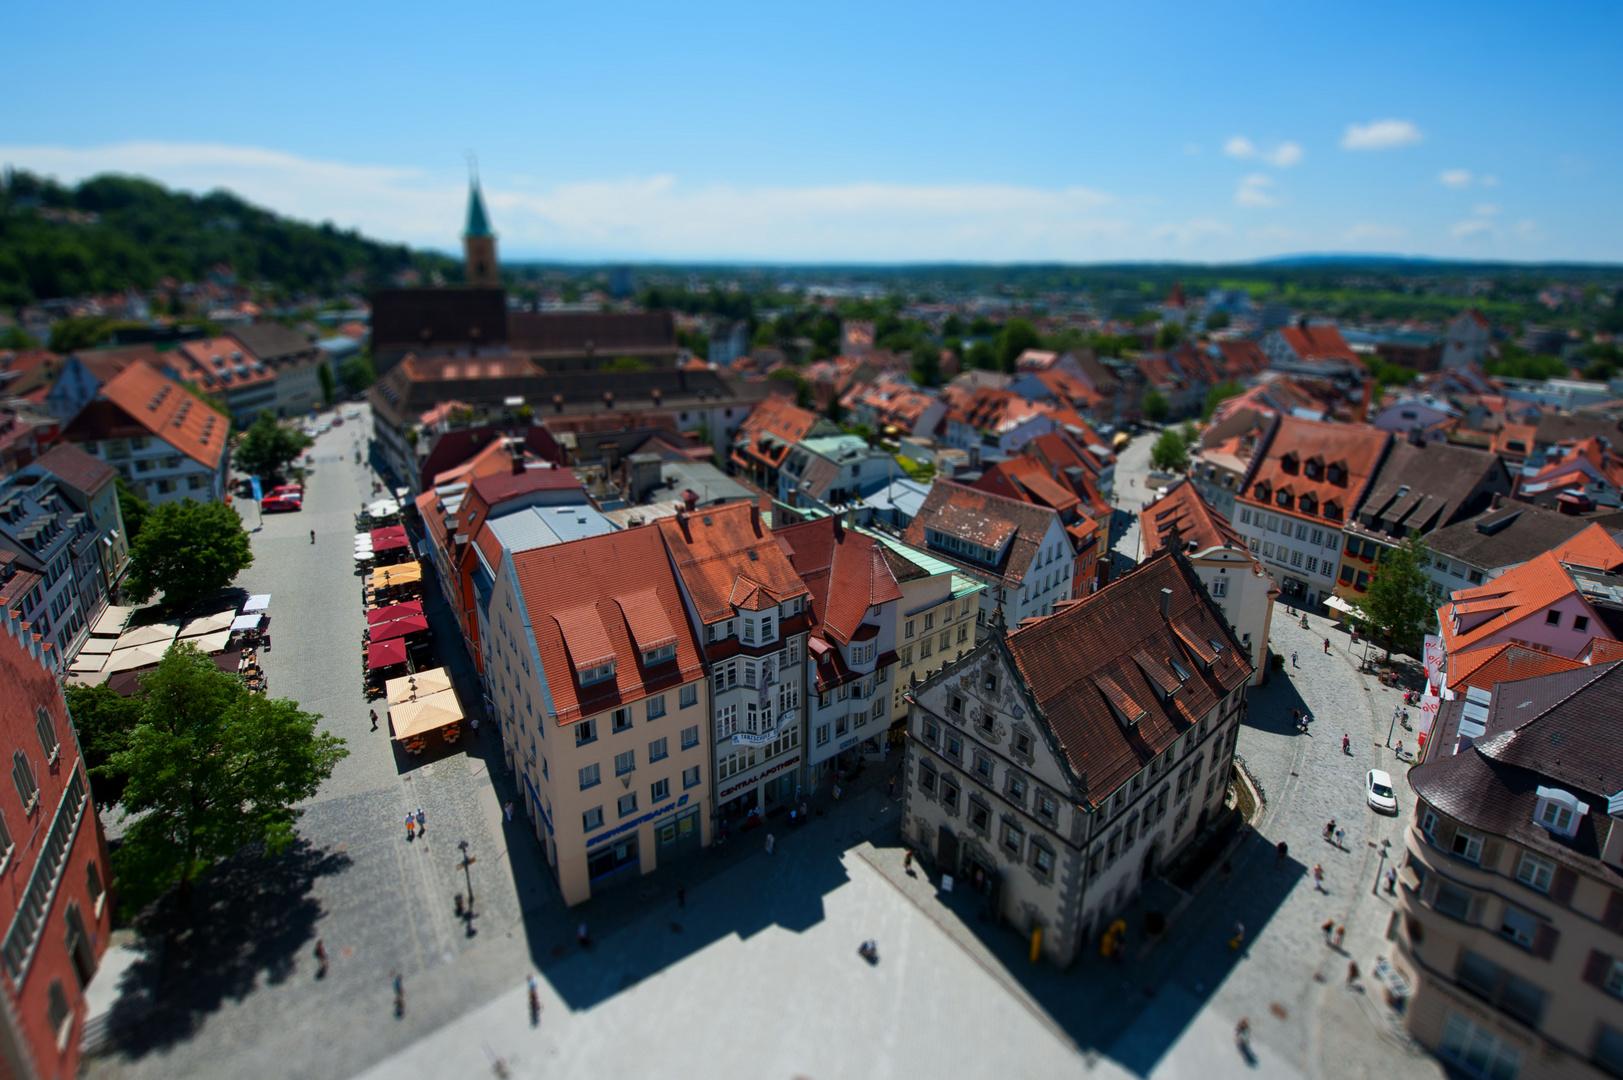 Ravensburg Turmbesteigung